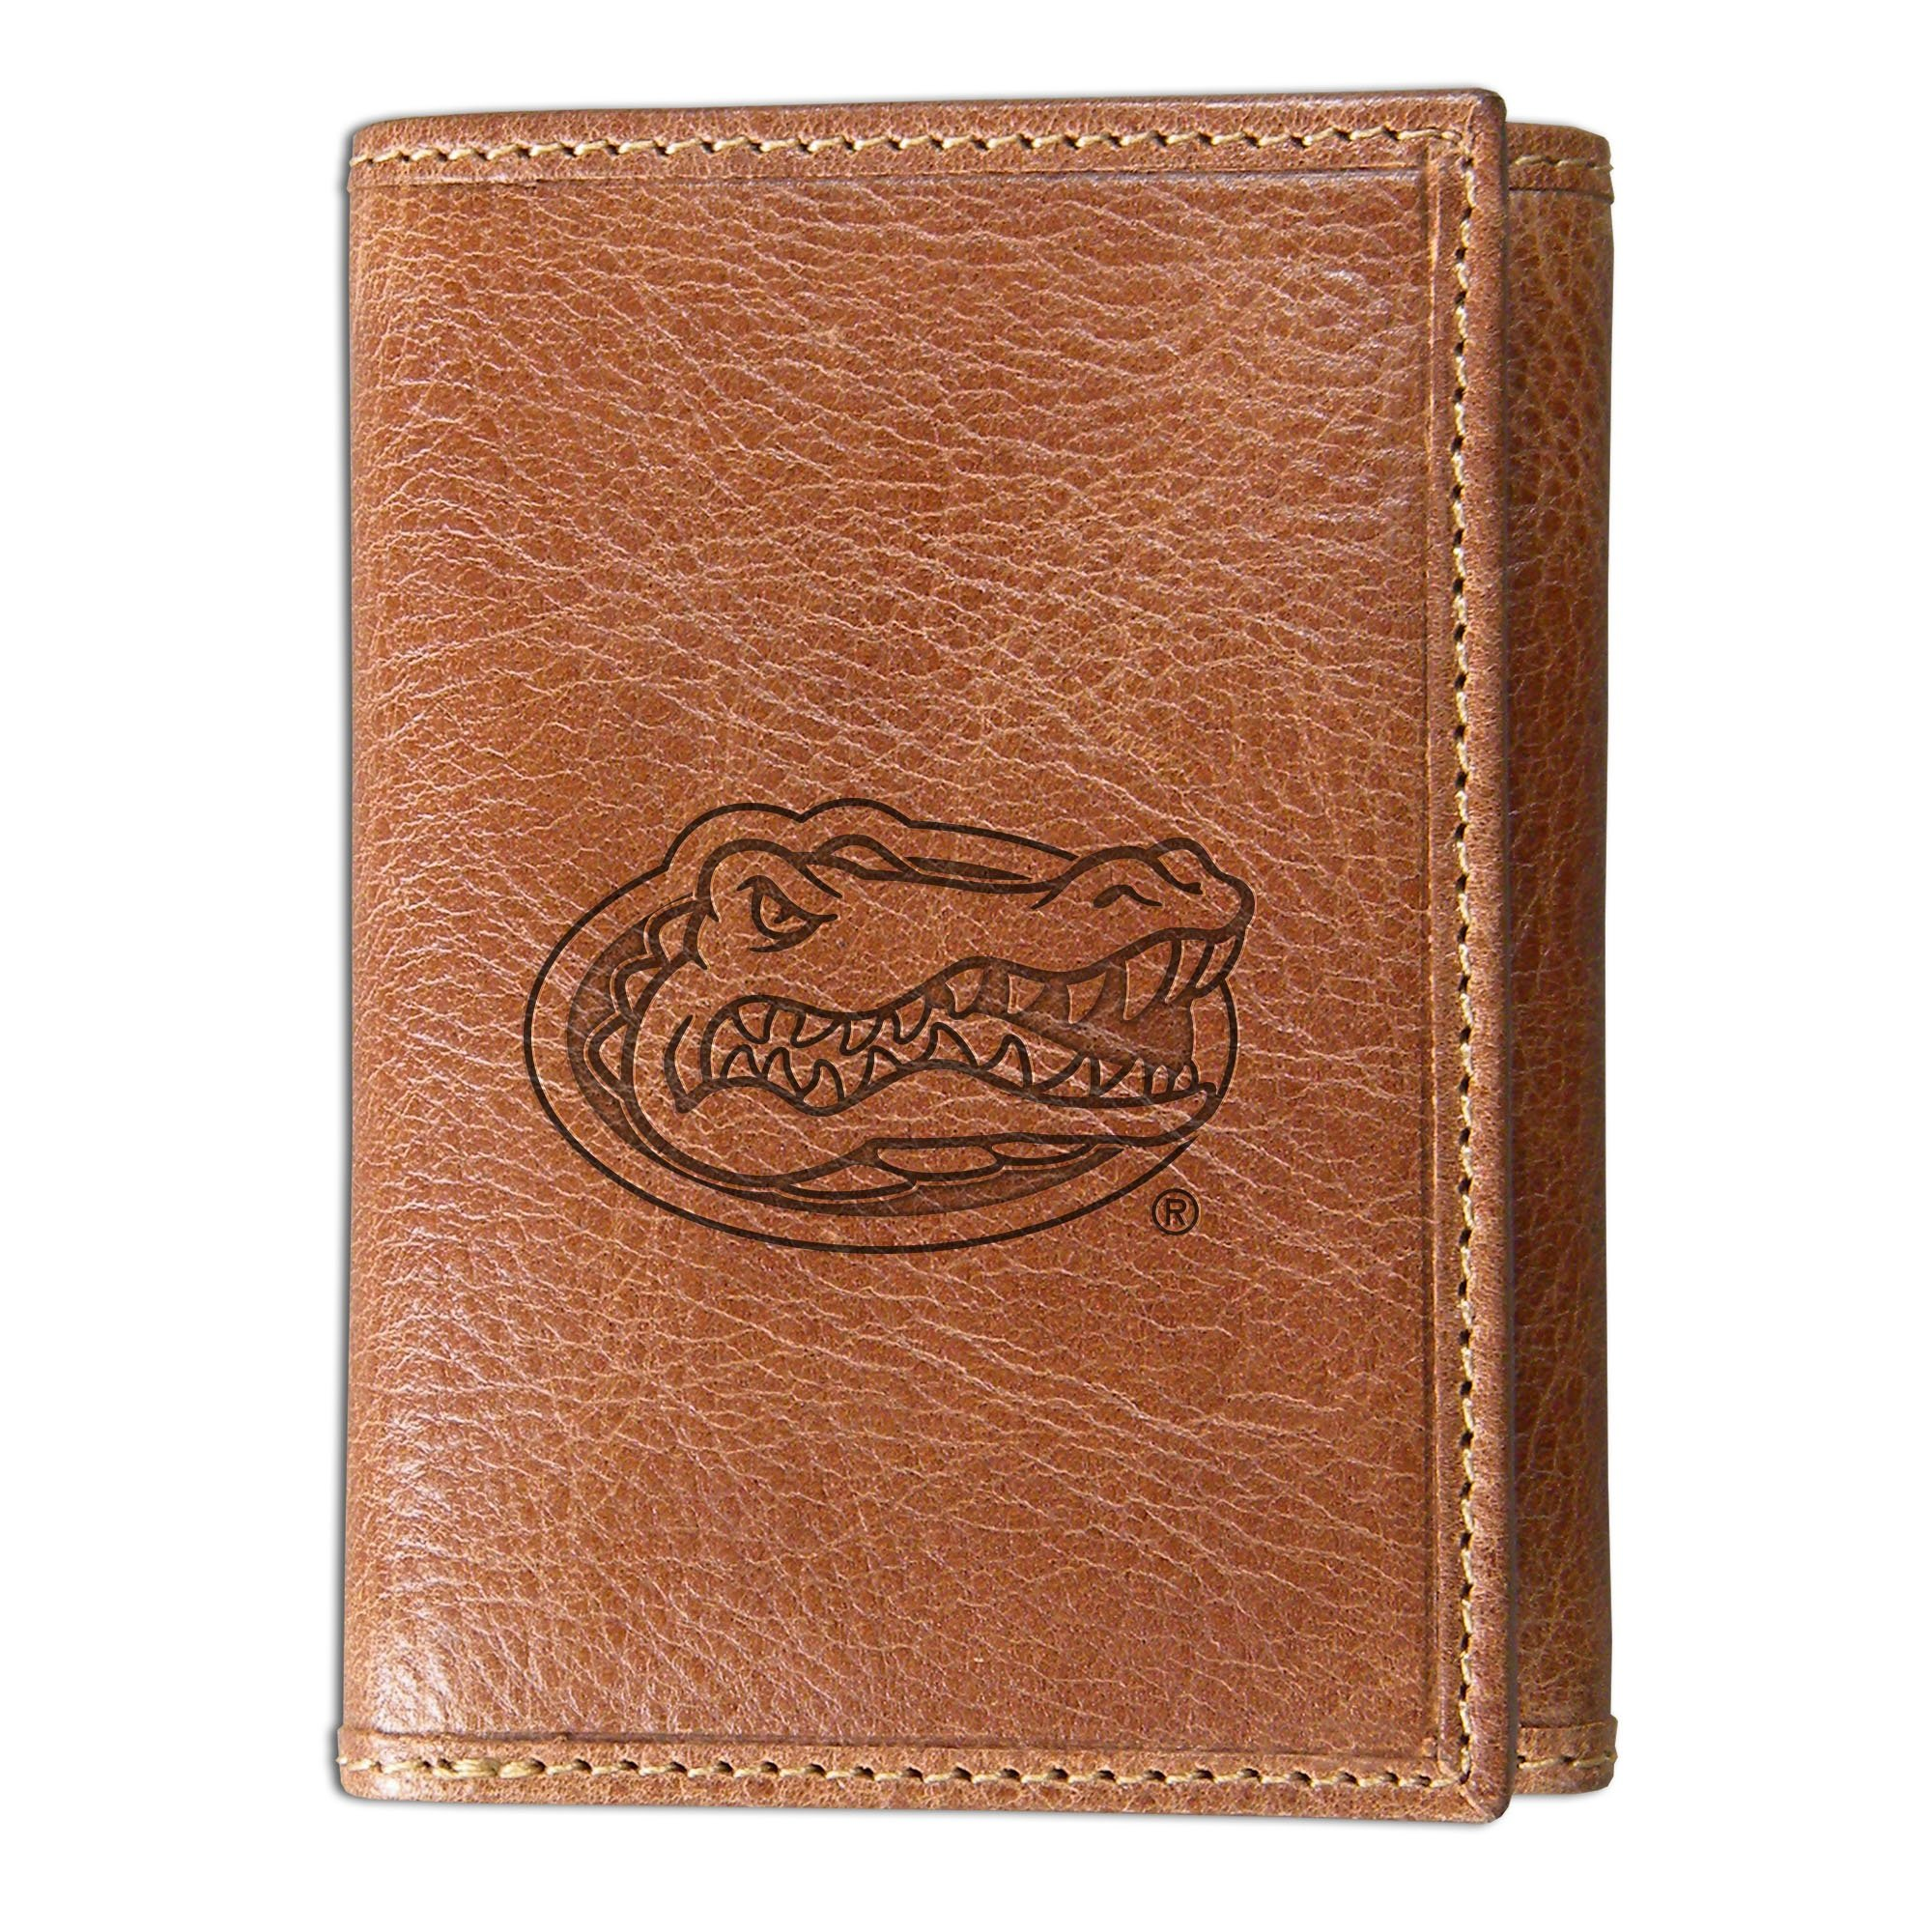 University of Florida Westbridge Leather Wallet (Trifold)